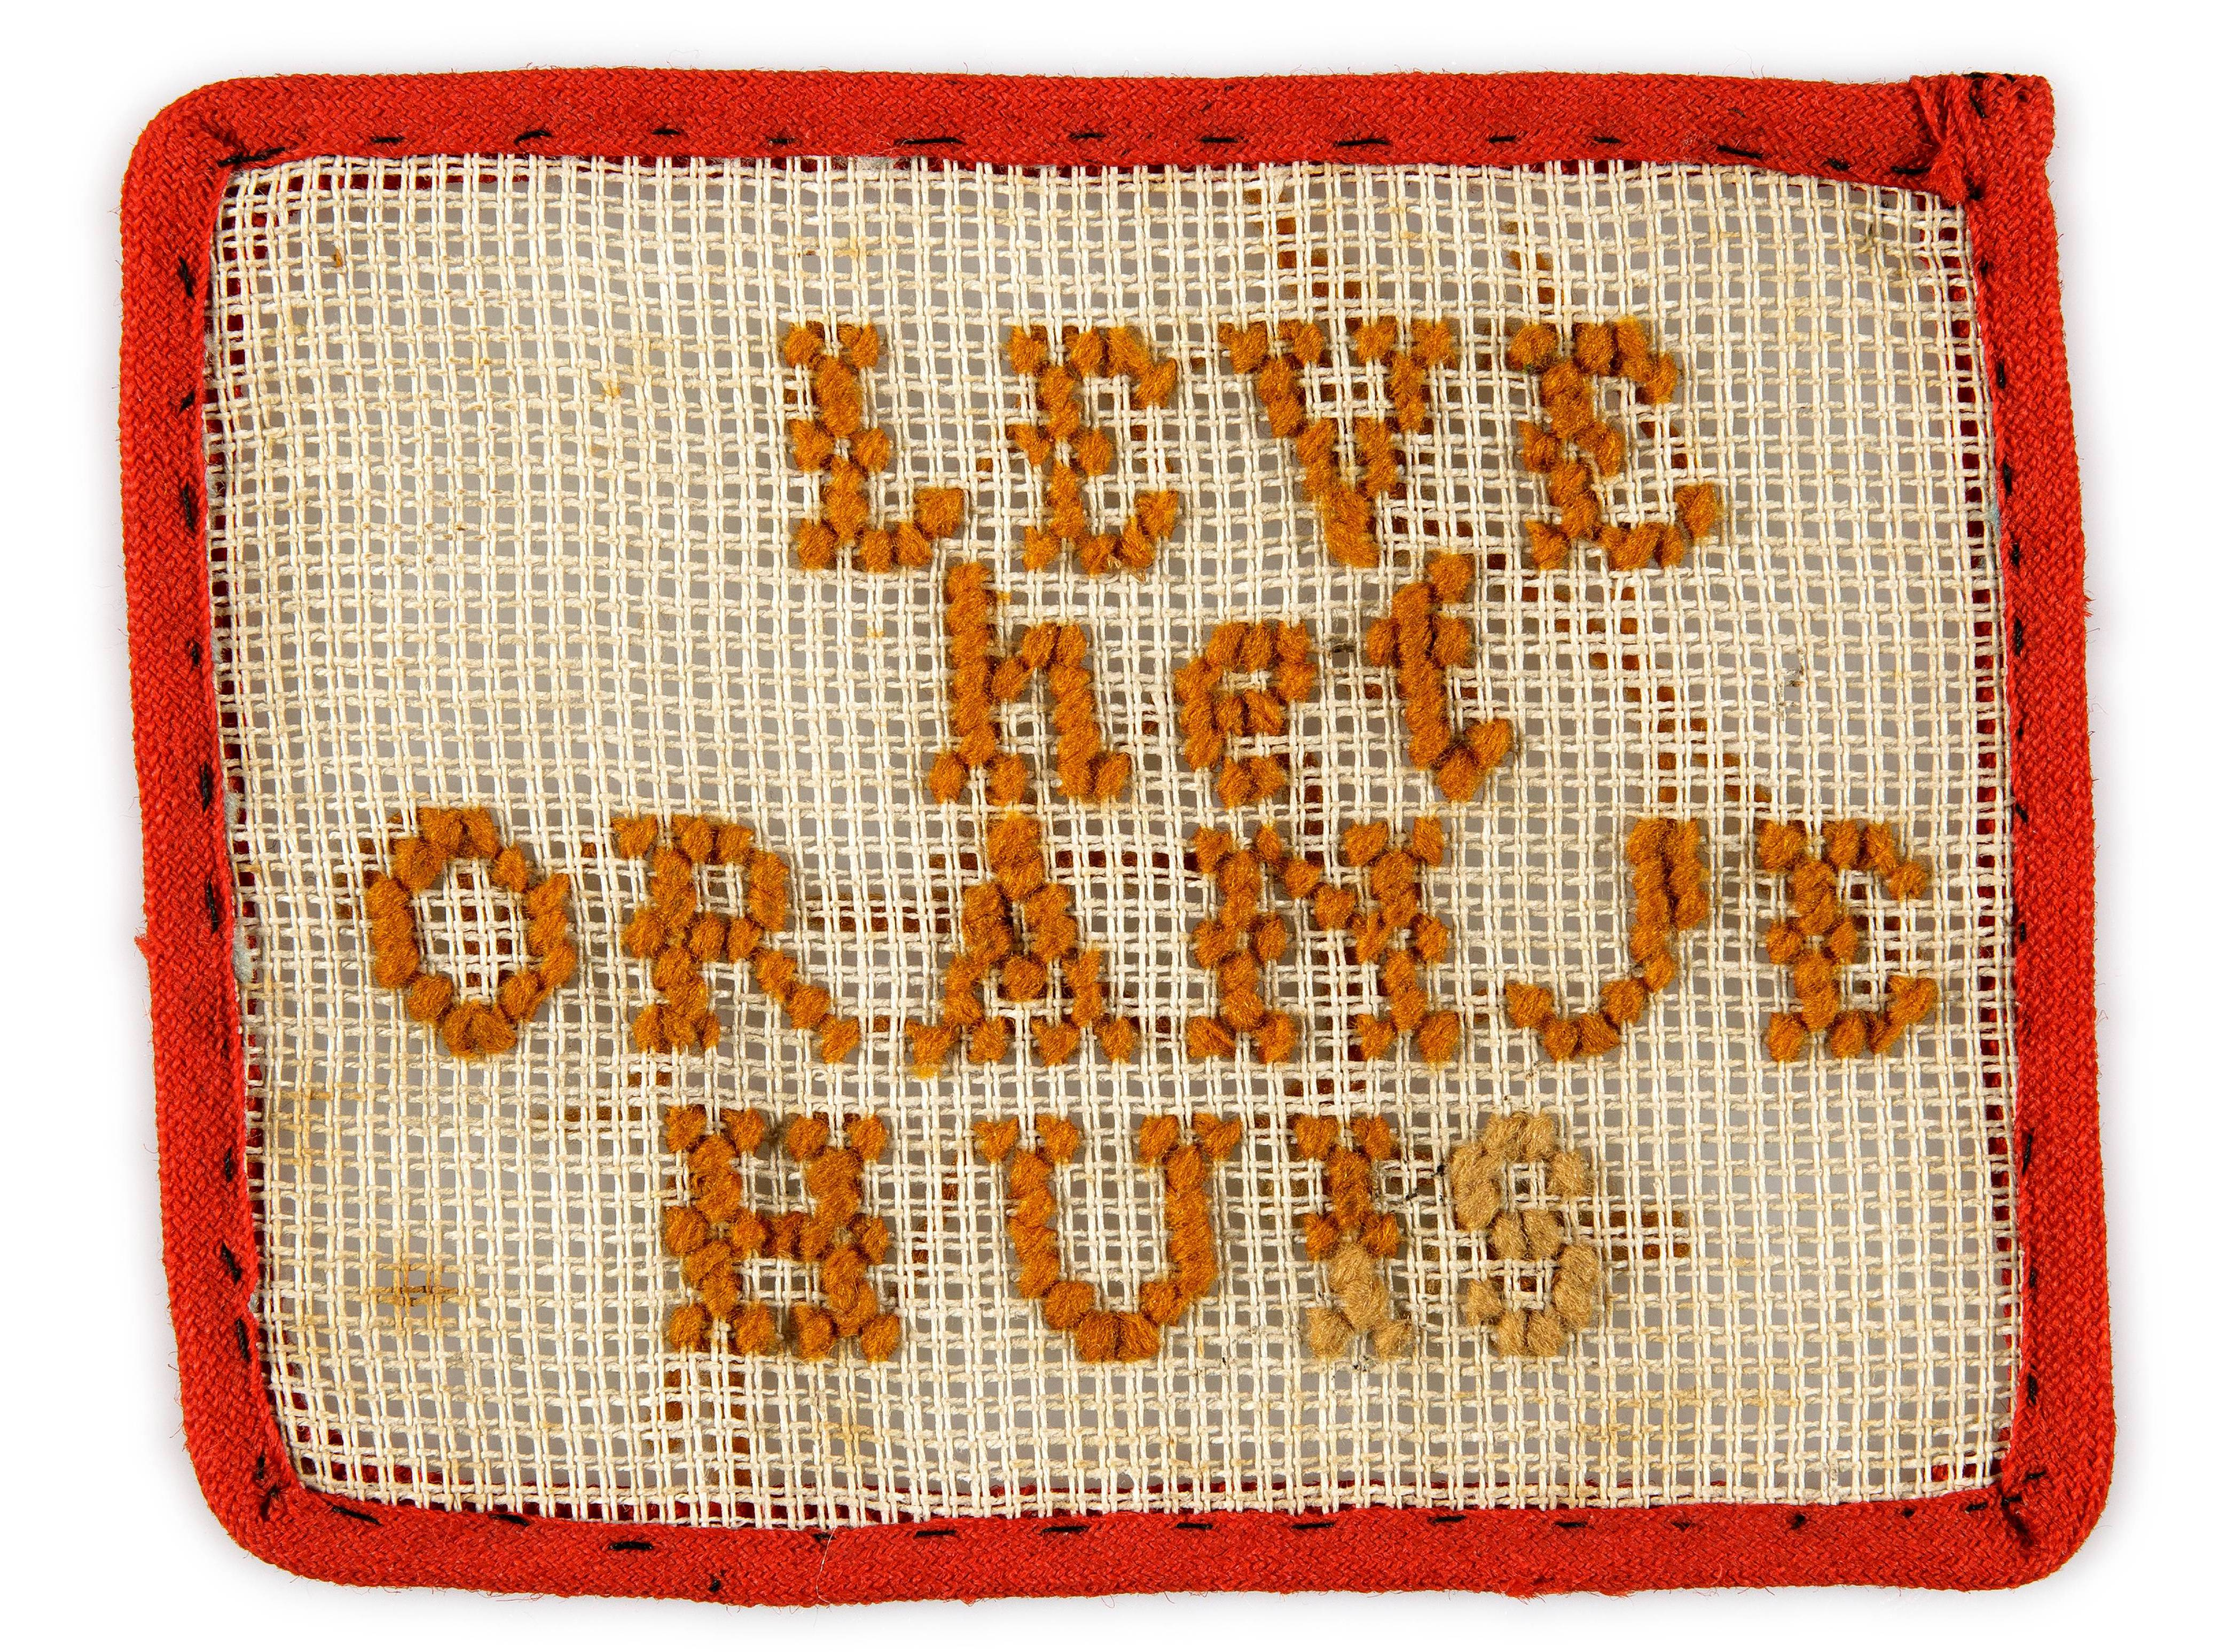 borduurlap 'leve het oranjehuis'